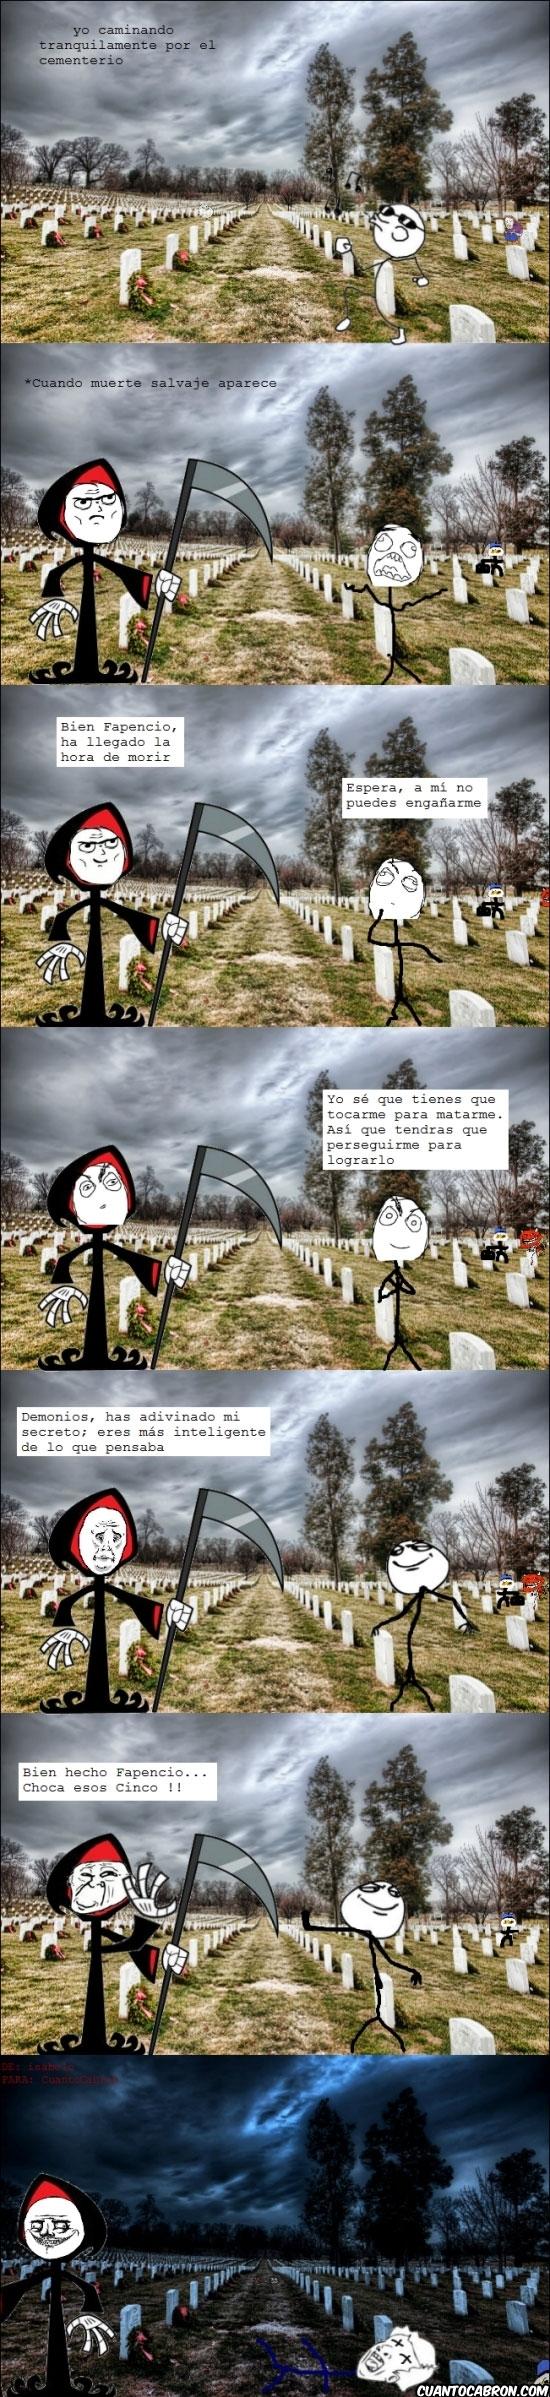 cementerio,choca esos cinco,diablo,dolan,engañar,escapar,miedo,muerte